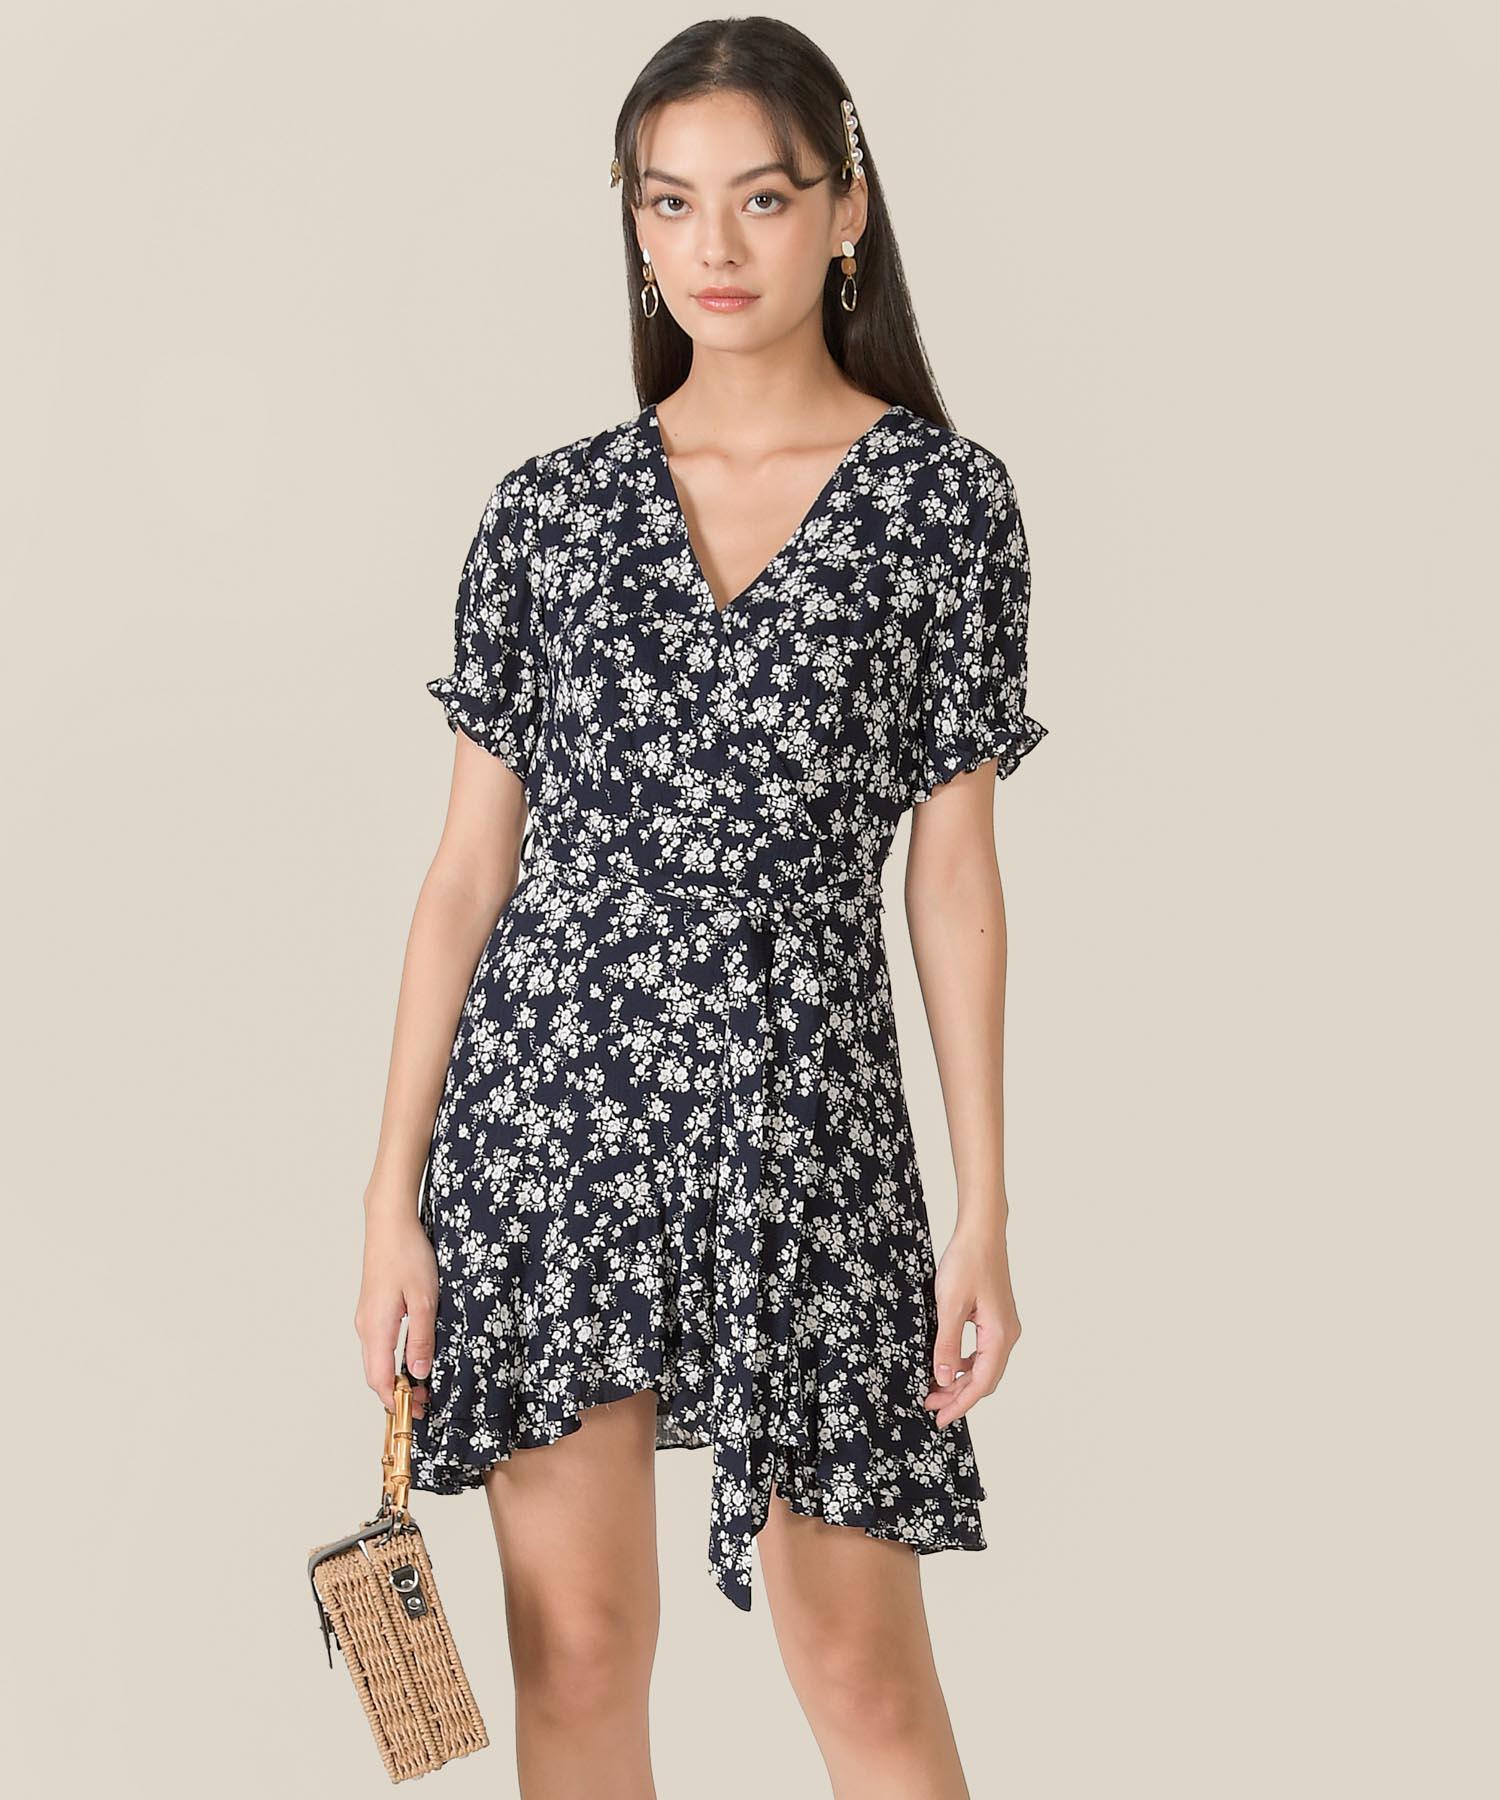 rue-floral-ruffle-overlay-dress-midnight-blue-1